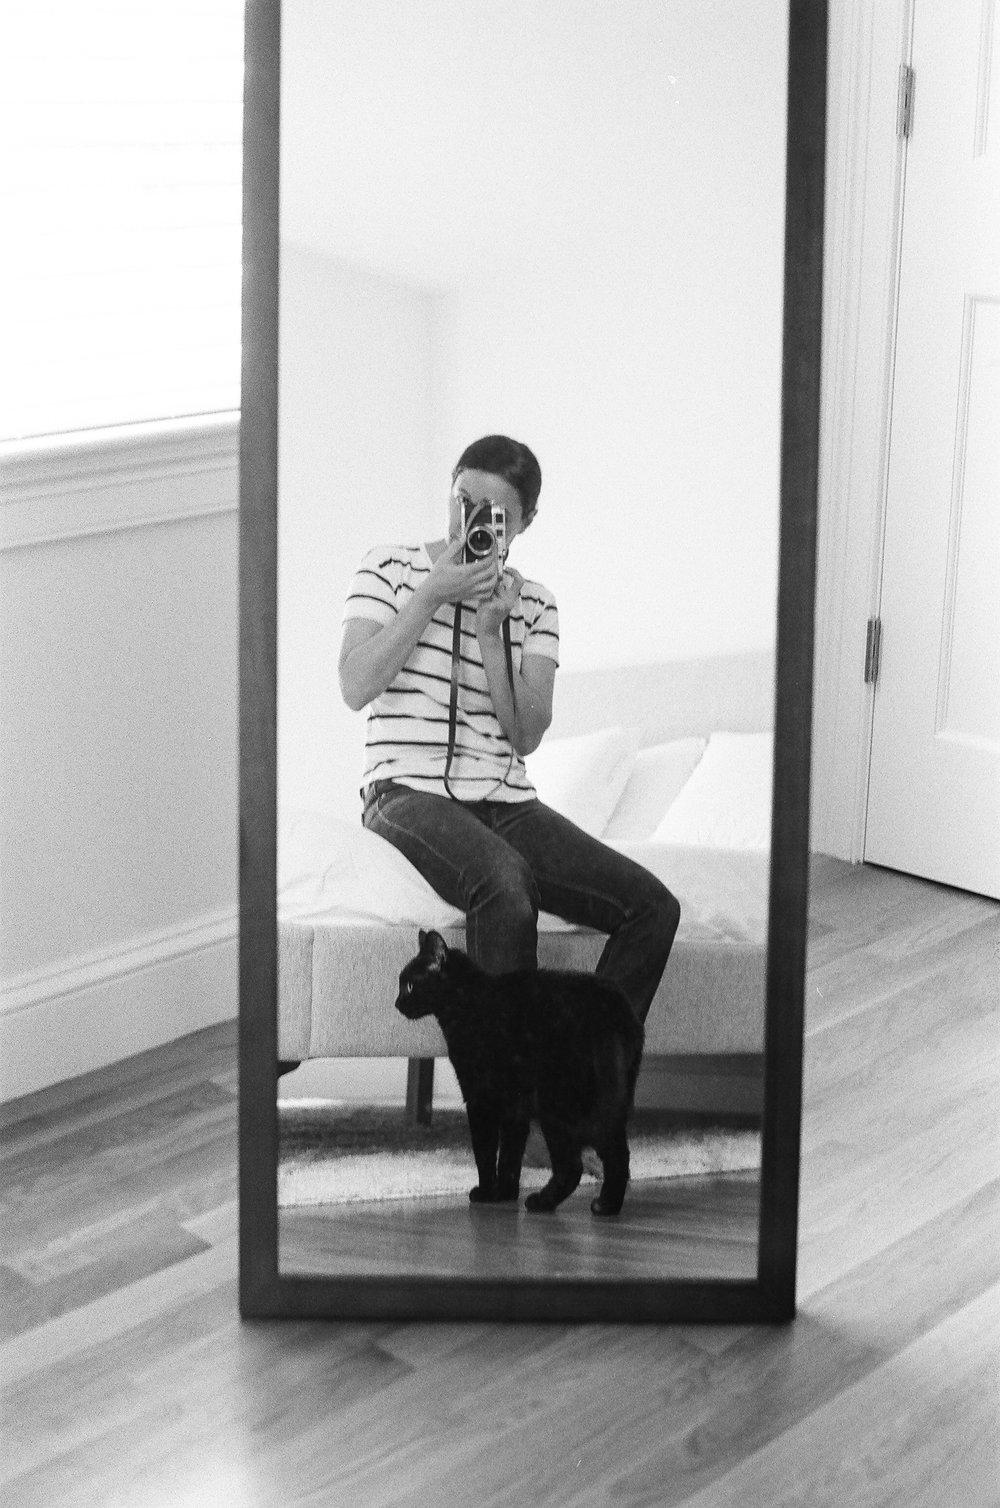 LeicaM3092017-1036.jpg